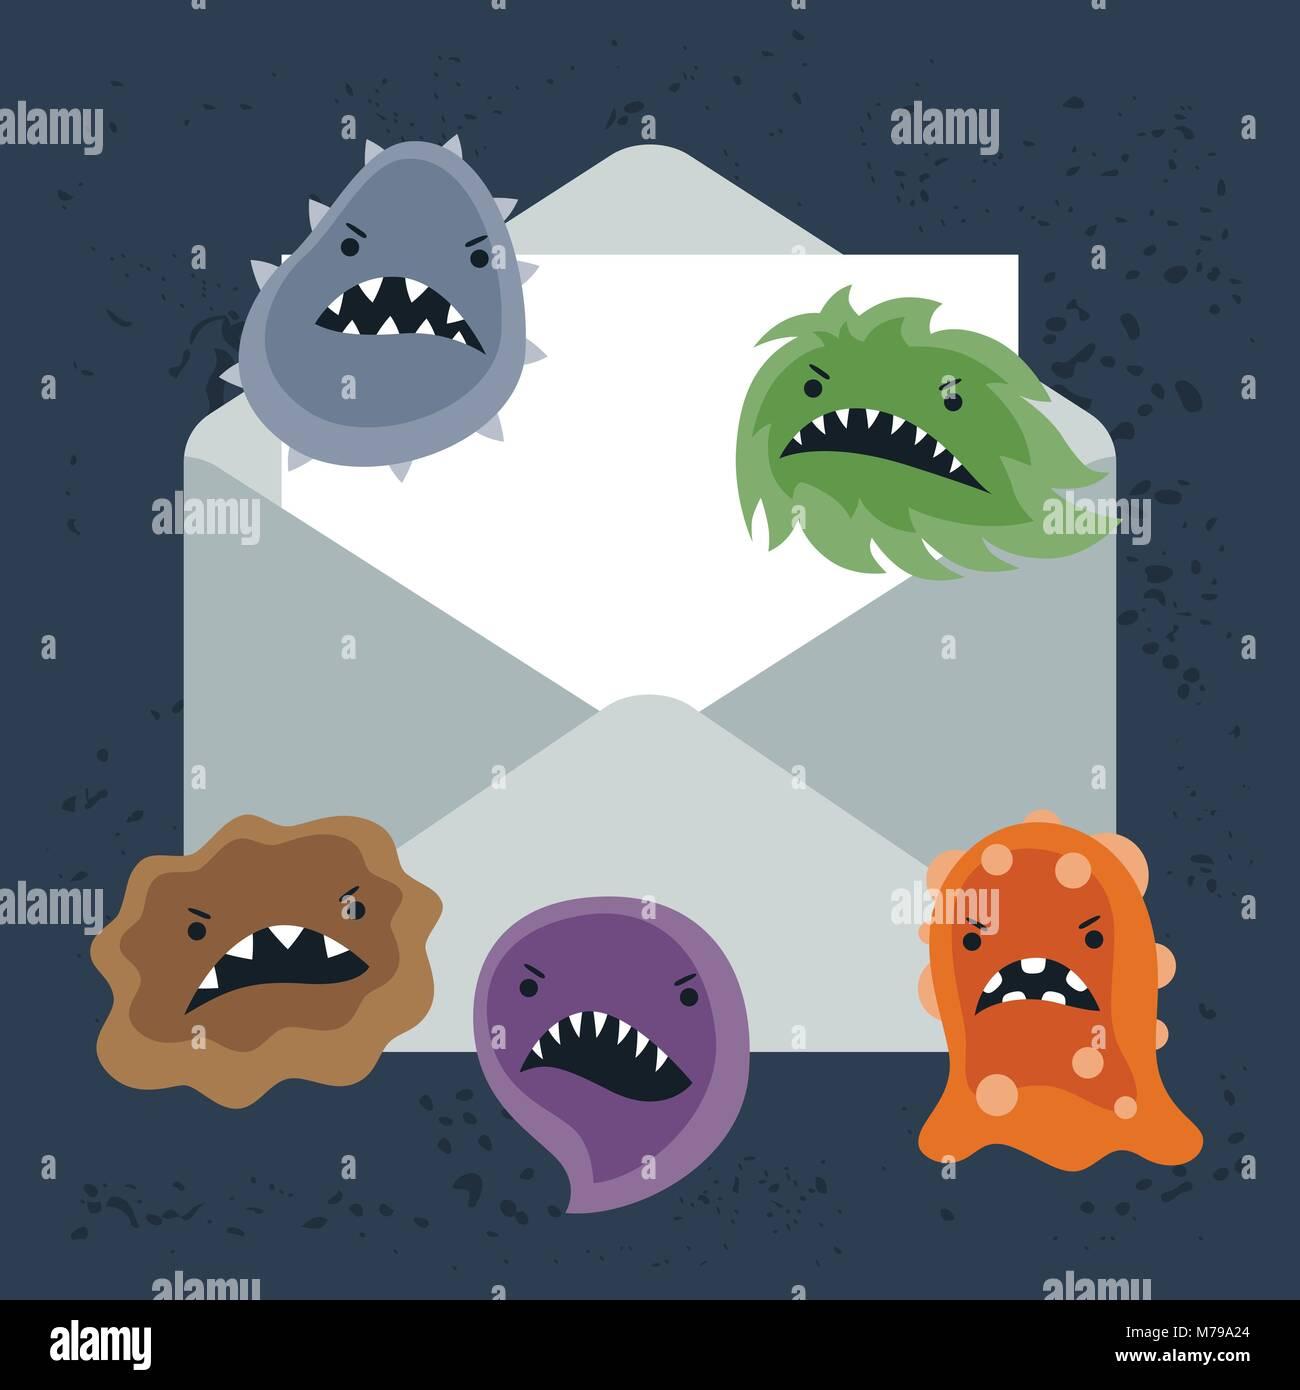 Abstrakte Abbildung e-mail Spam Virus Infektion. Stockbild